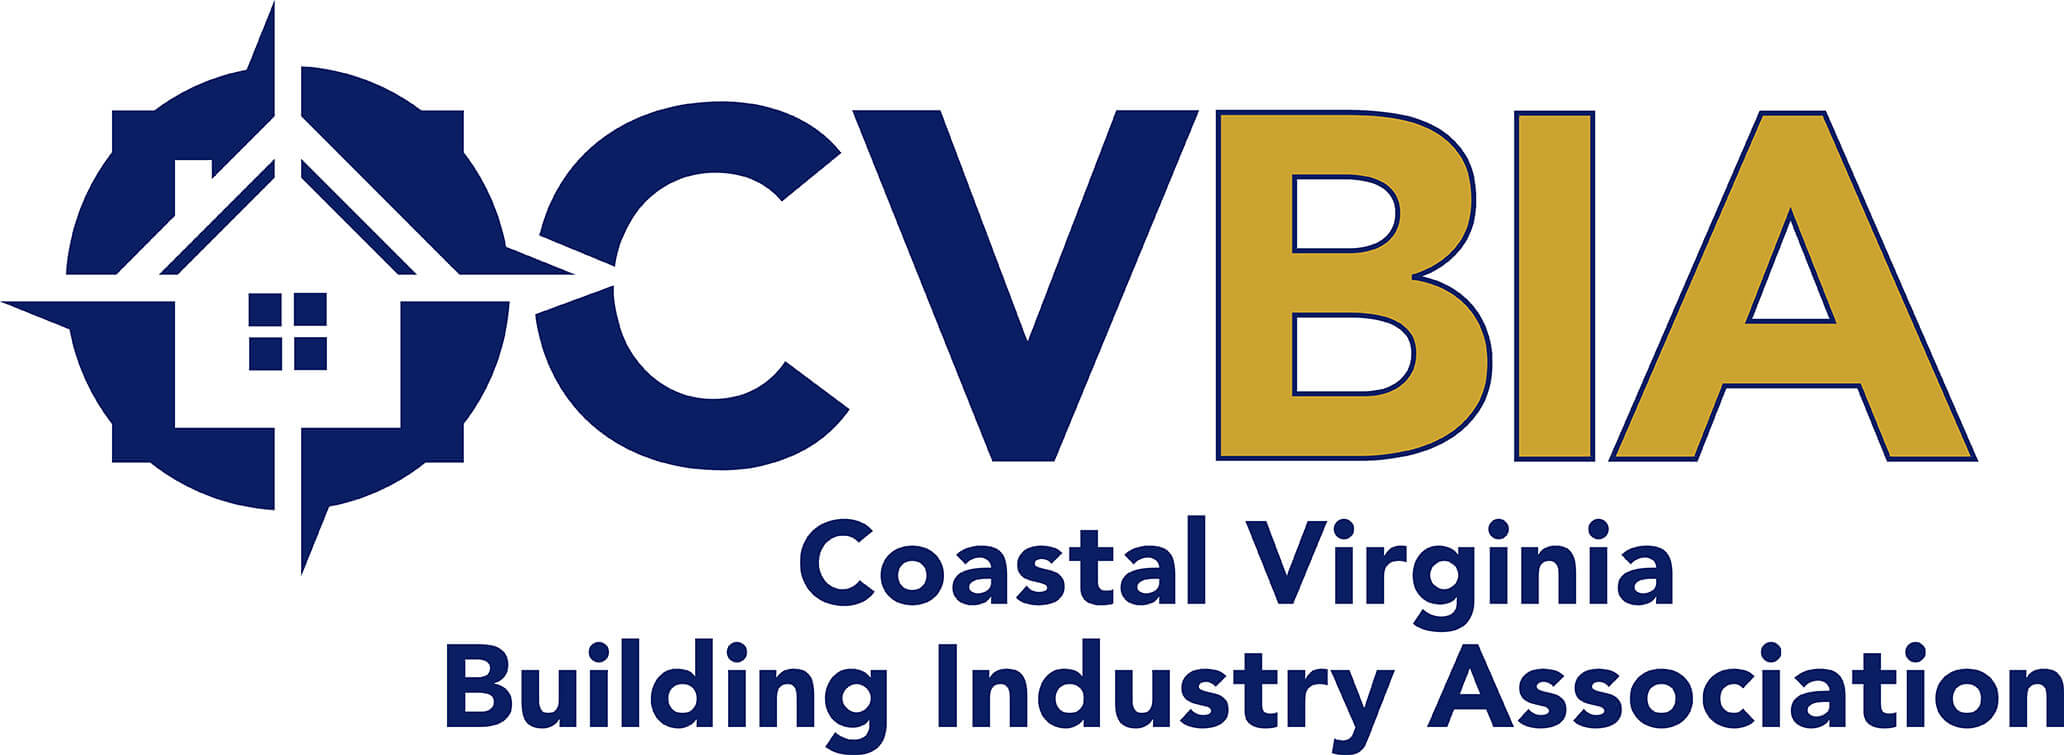 Logo - Coastal Virginia Building Industry Association